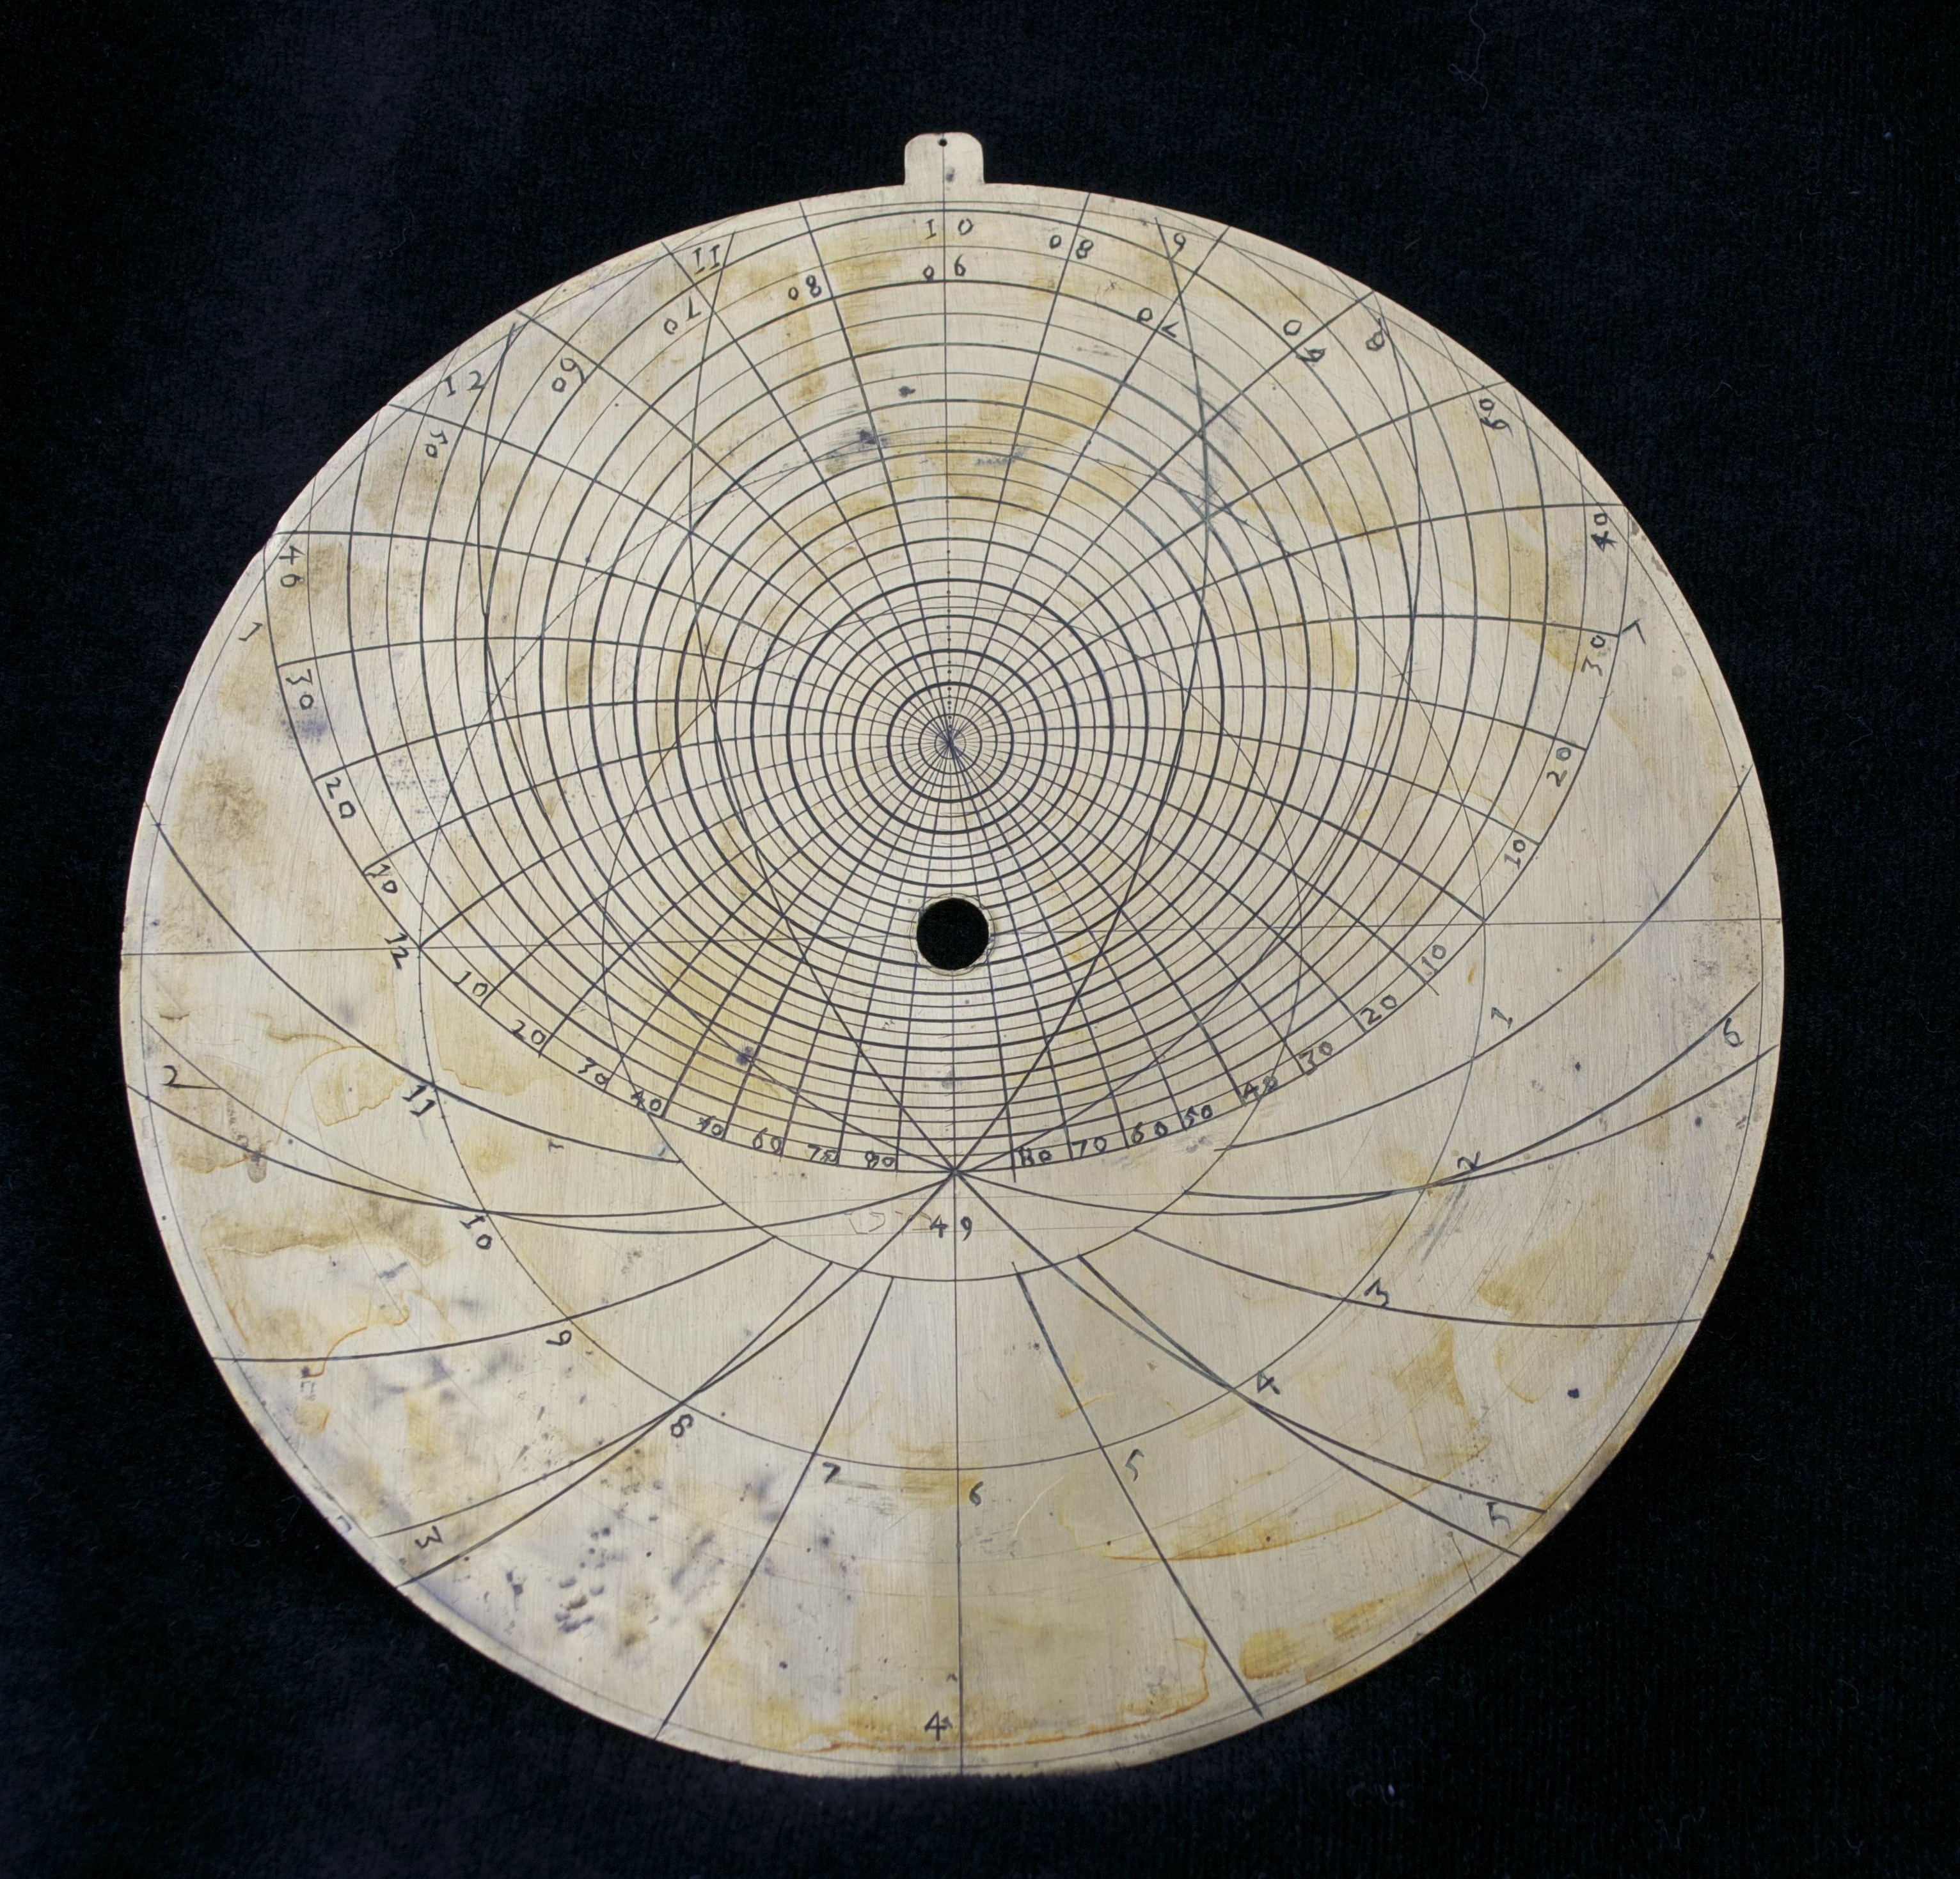 ancient astronomy symbols - HD3064×2937